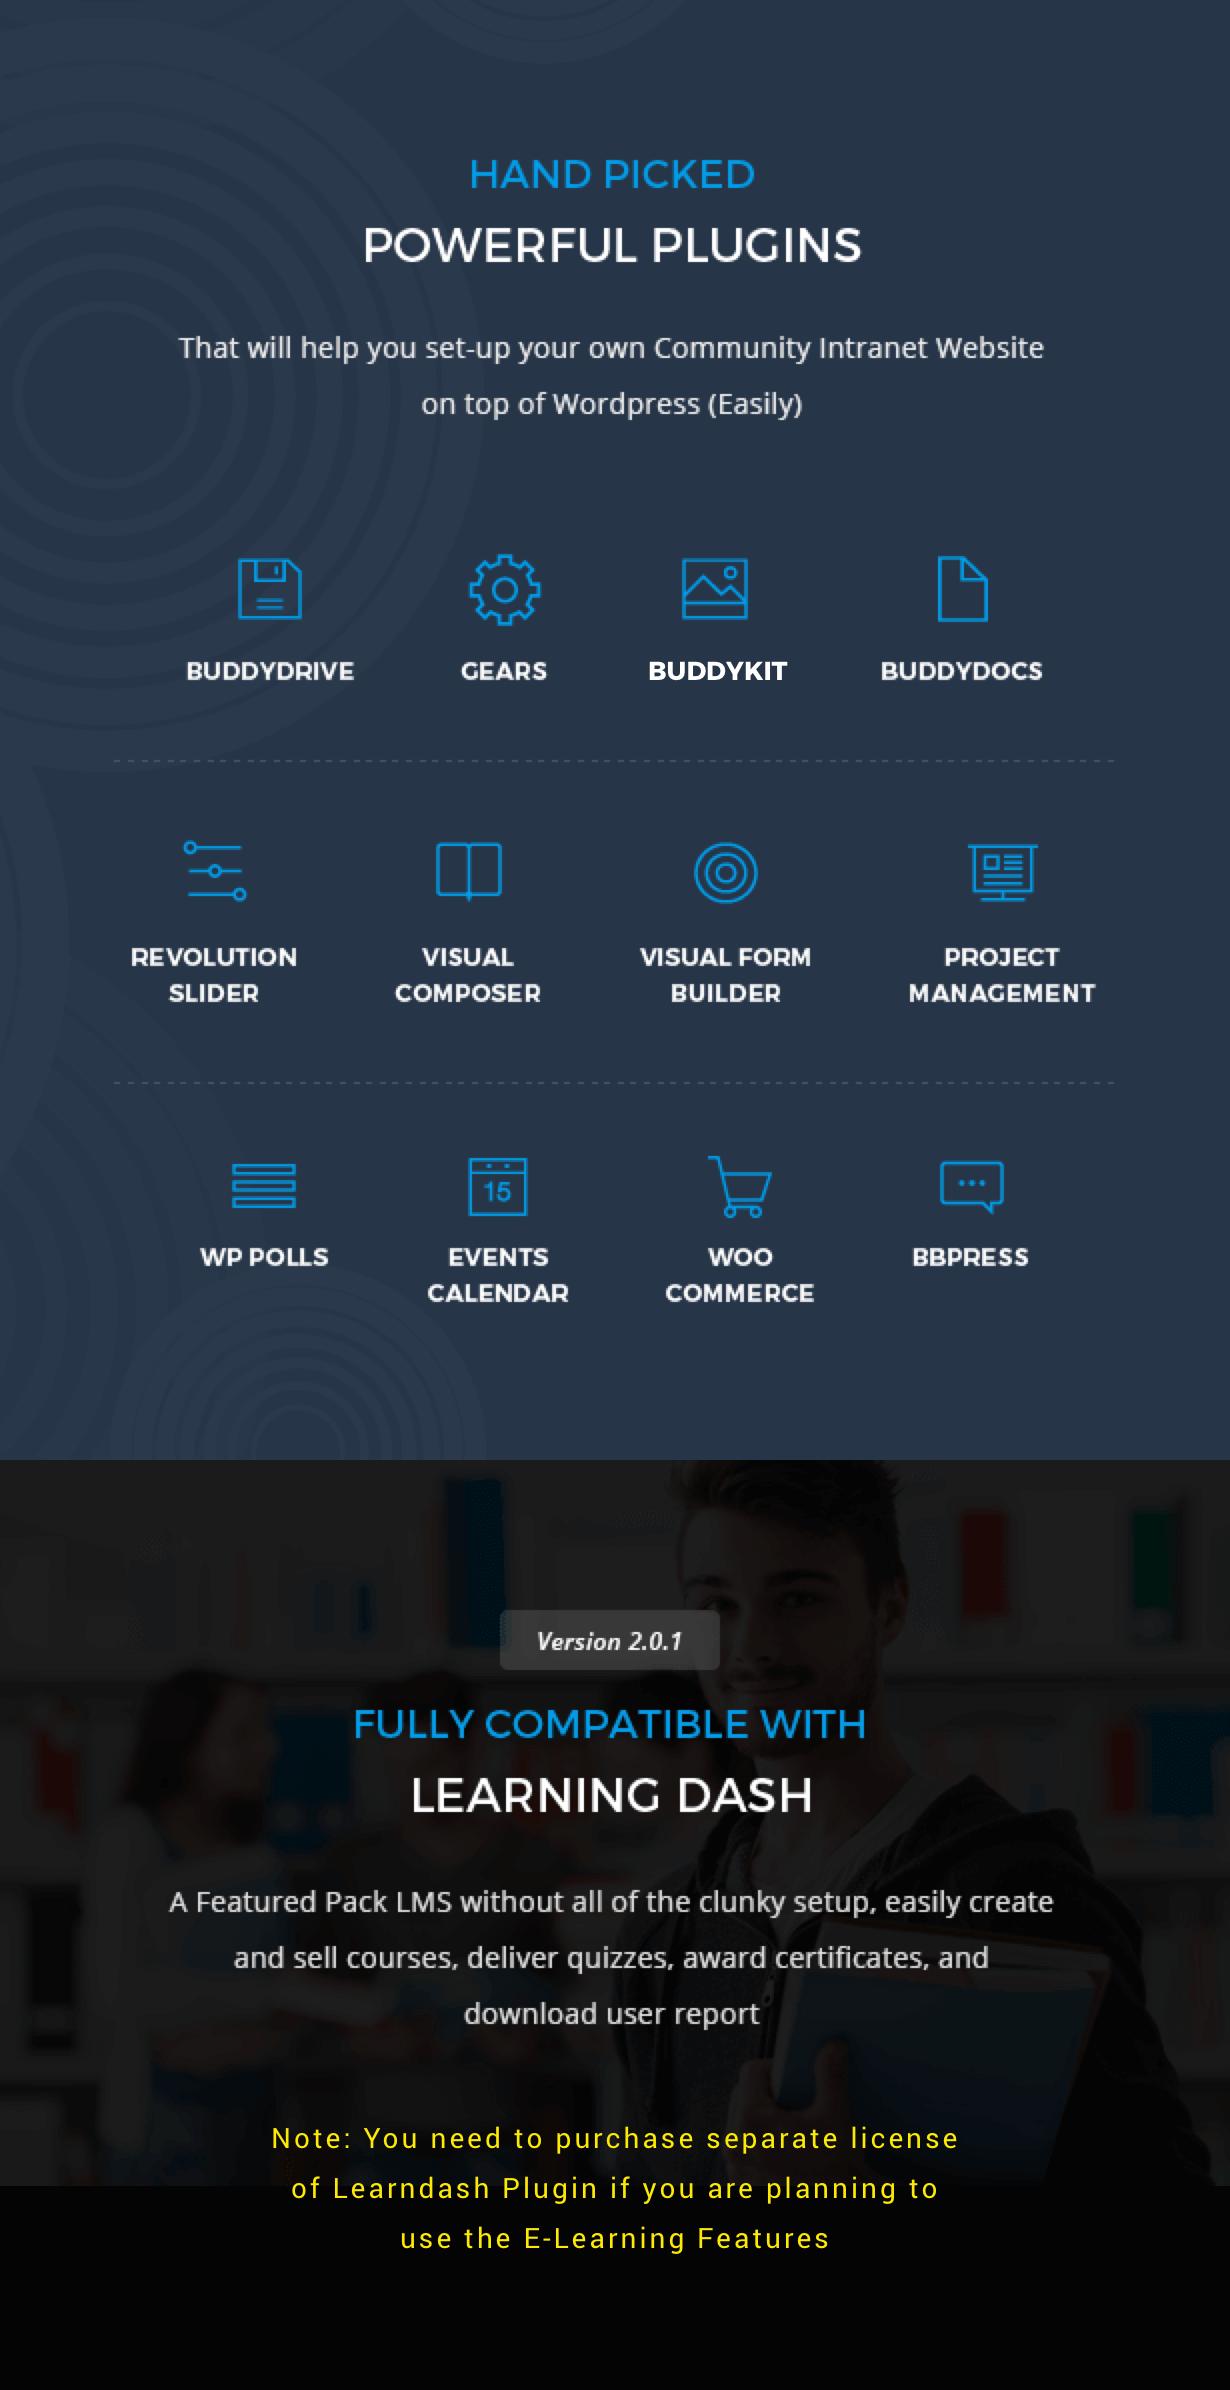 6 Handpicked+Powerful+Plugins - Thrive - Intranet & Community WordPress Theme